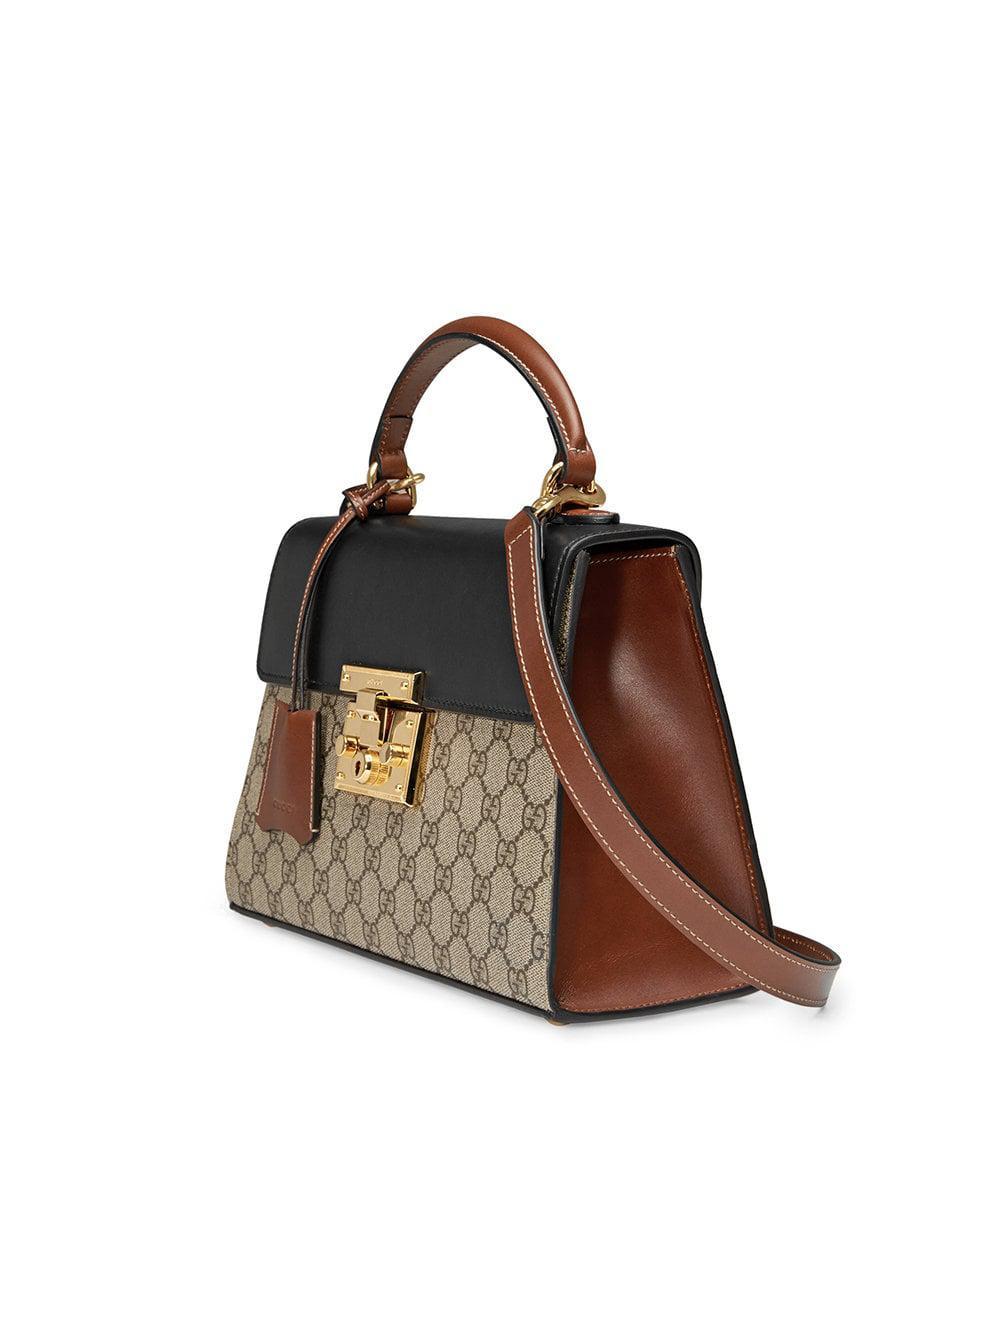 758f5af92a Gucci - Multicolor Borsa A Mano Padlock In Tessuto Gg Supreme - Lyst. View  fullscreen